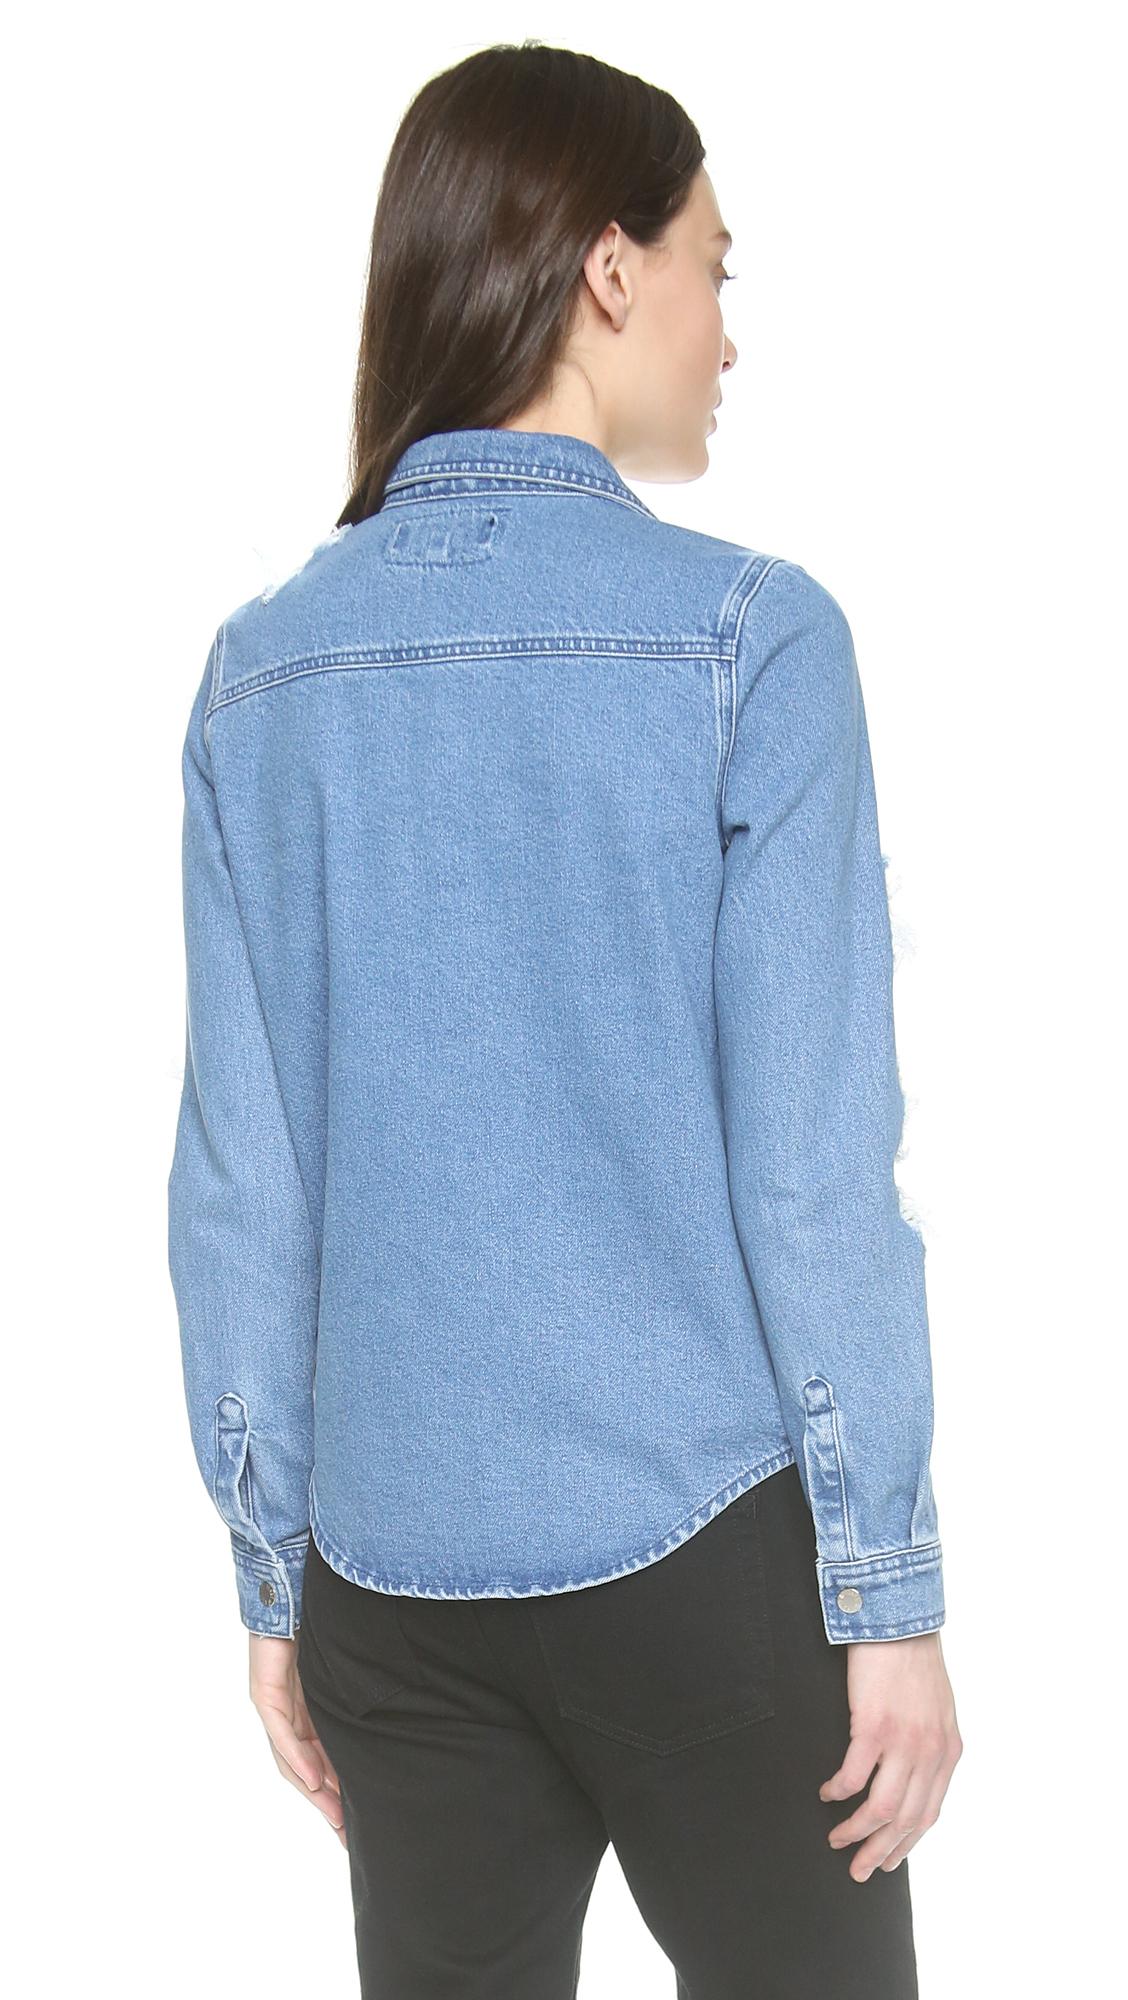 House Of Holland Tartan Denim Shirt Blue In Blue Lyst